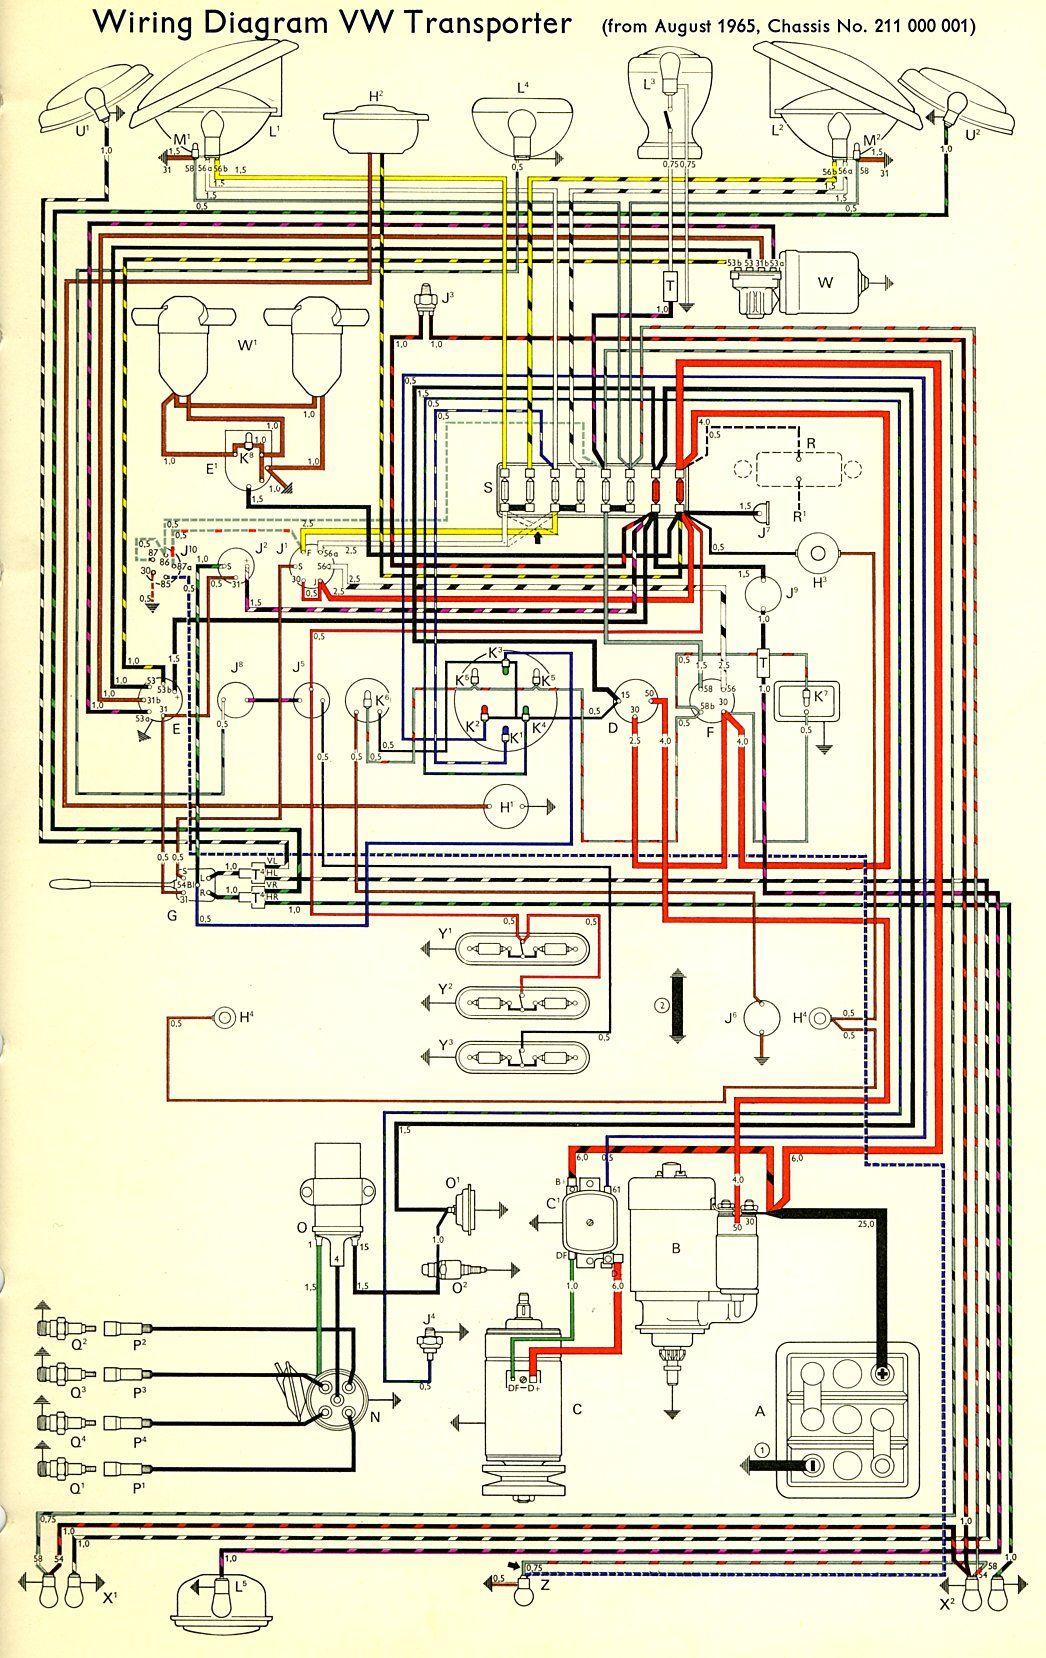 Thomas Built Bus Electrical Diagrams -Led Button Wiring Diagram   Begeboy Wiring  Diagram SourceBegeboy Wiring Diagram Source